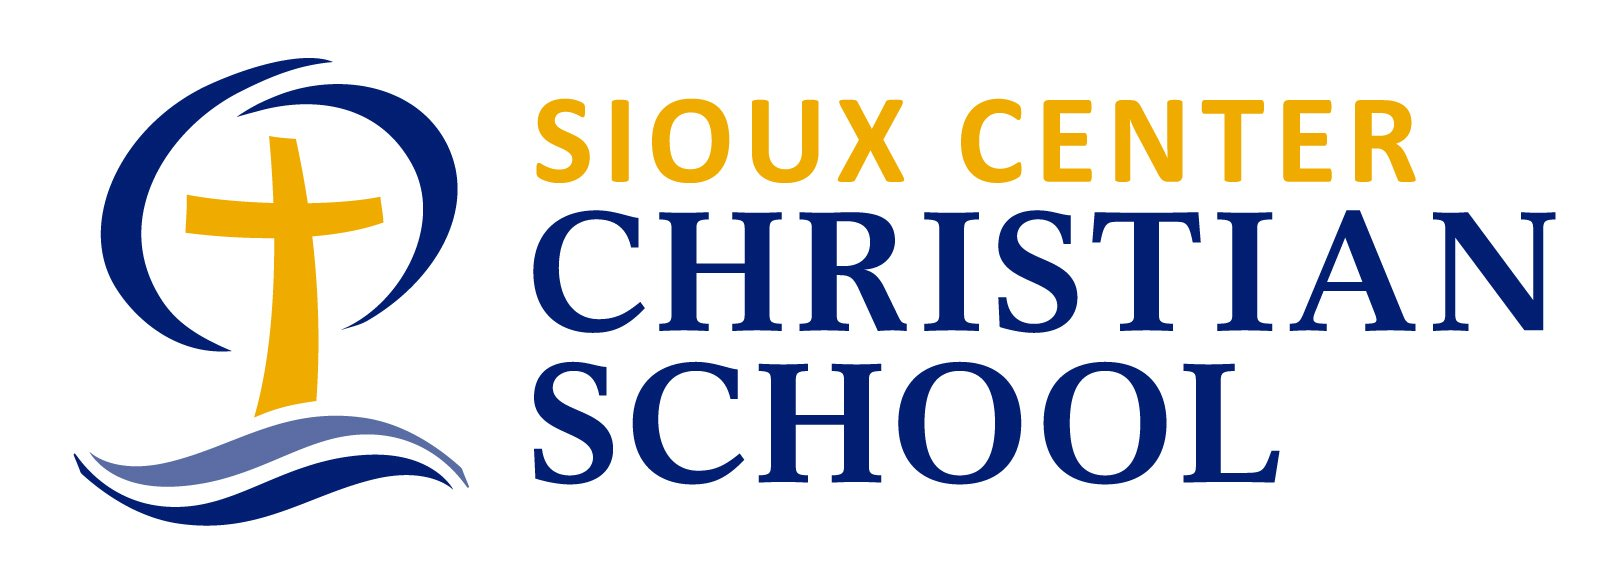 our logos sioux center christian school